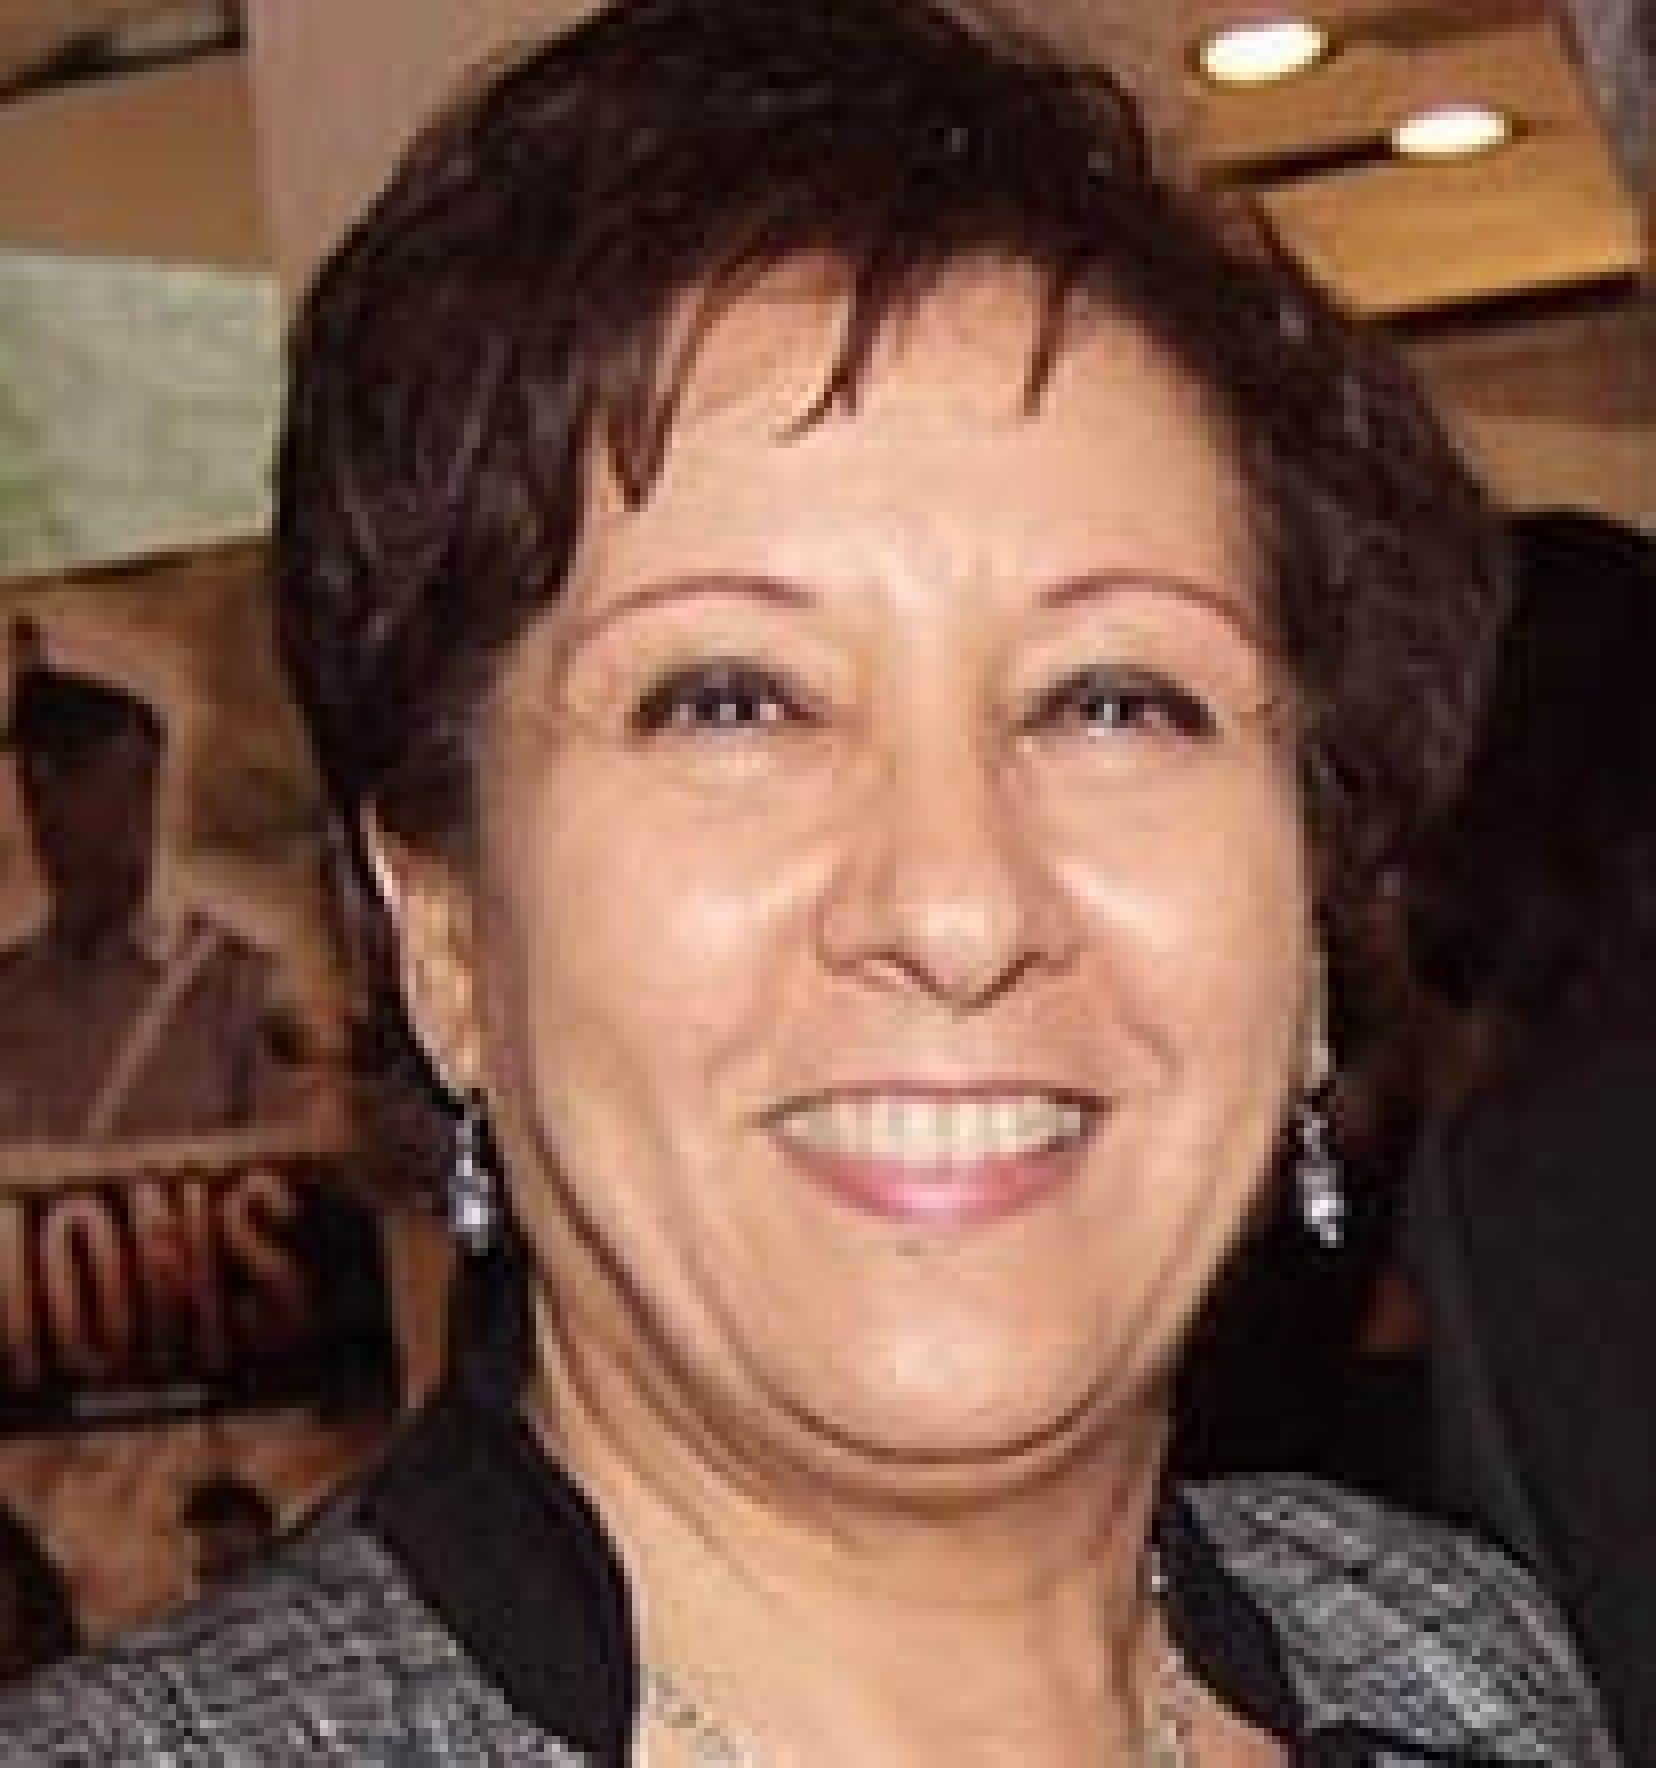 Rencontre marocain a montreal,annonces rencontre mayotte